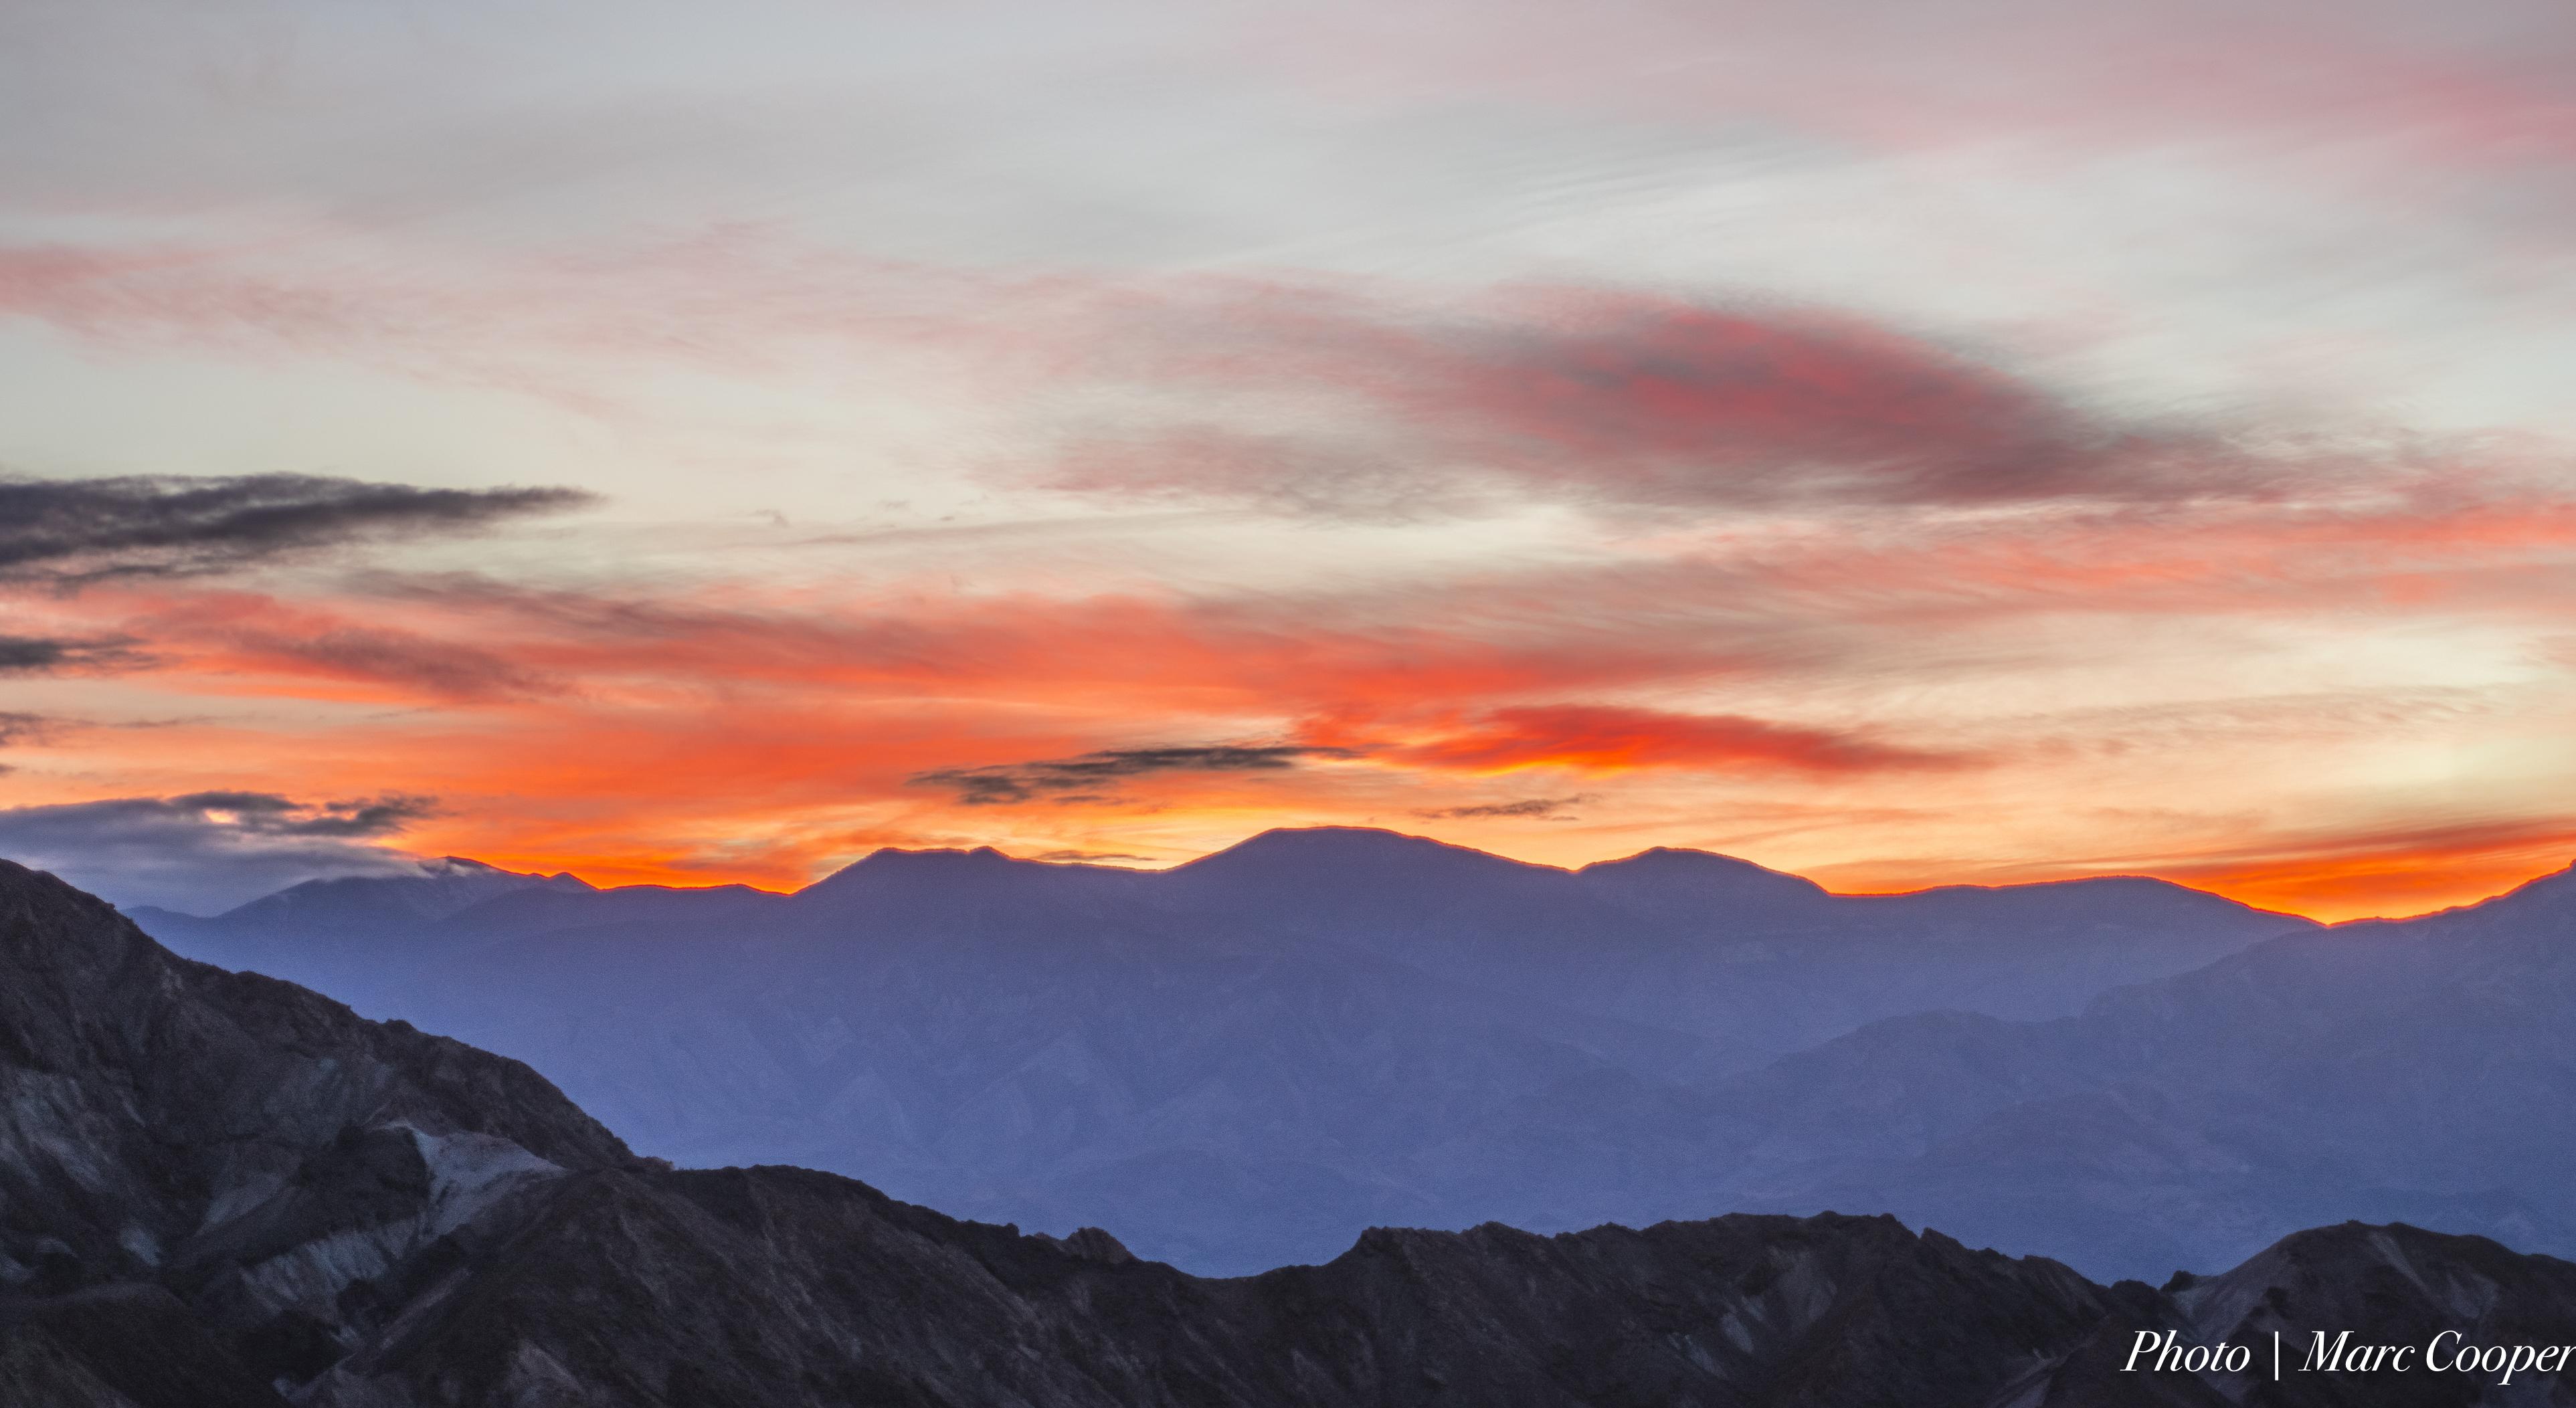 Sky on Fire, Blue, Mountains, Sunset, Sky, HQ Photo